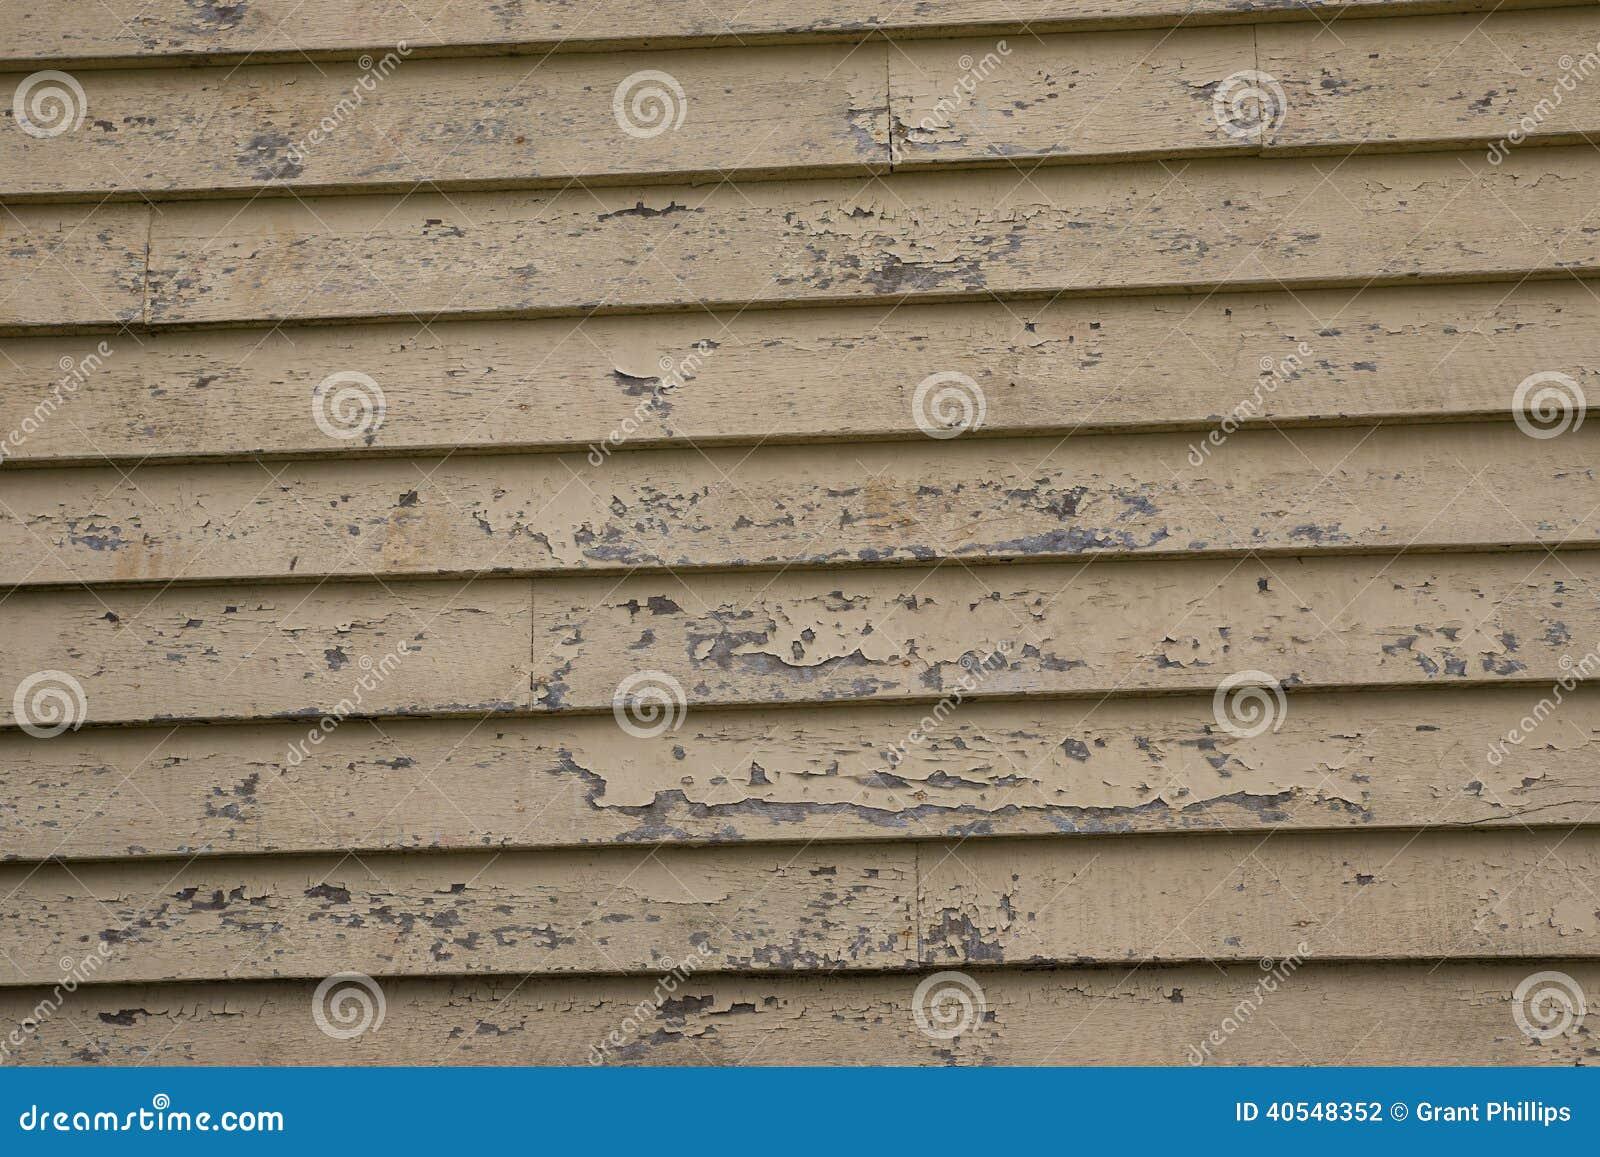 Distressed weatherboard